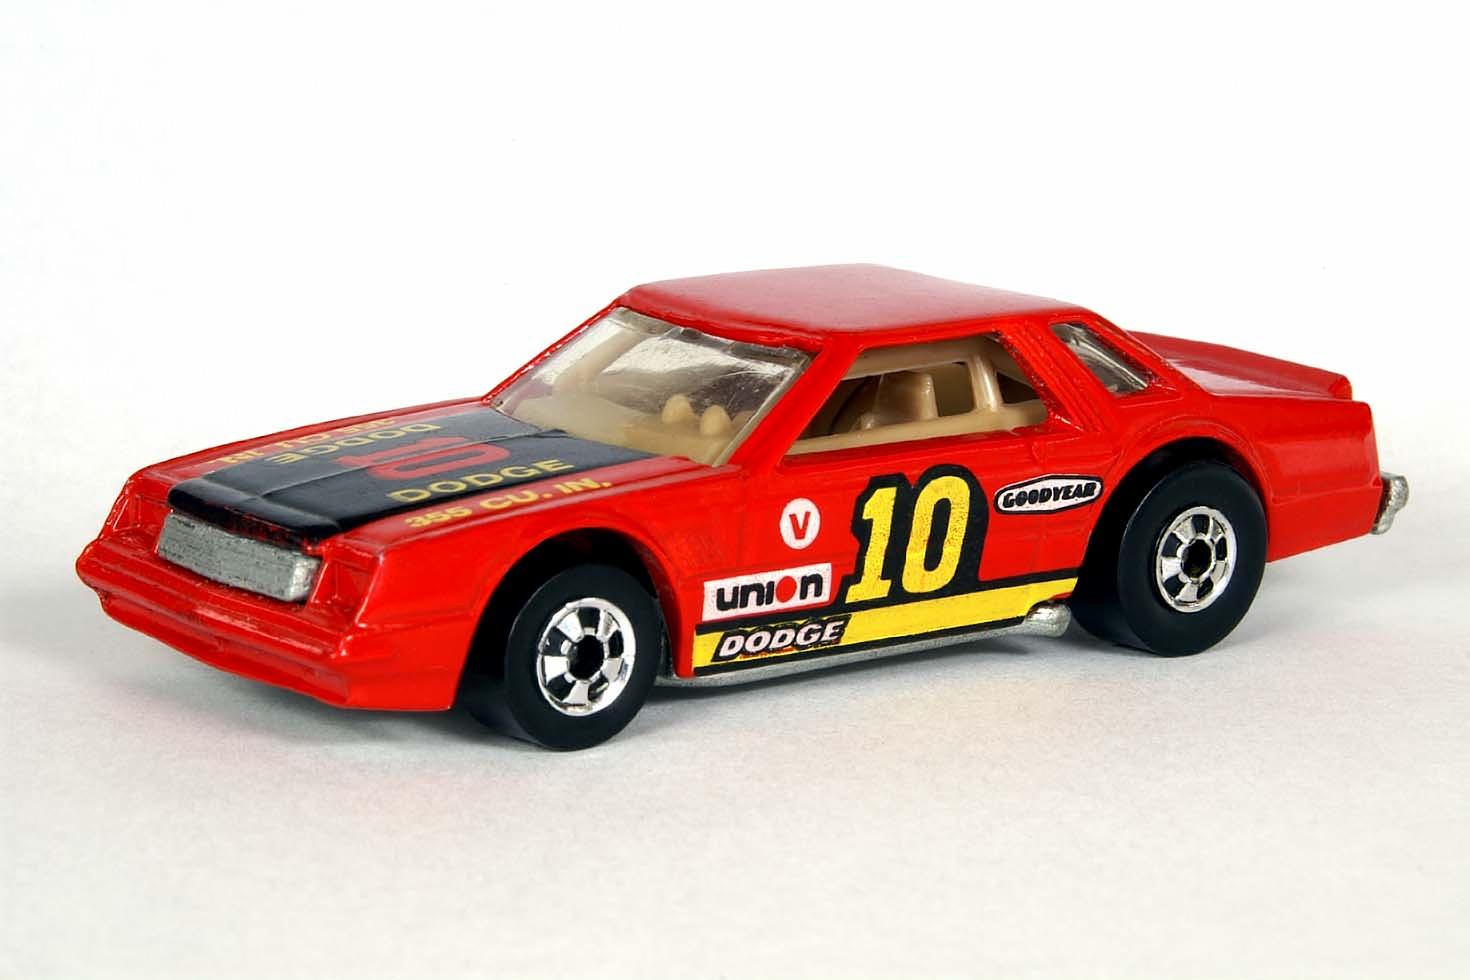 Mirada Stocker Hot Wheels Wiki Fandom Powered By Wikia 1980 Dodge Interior